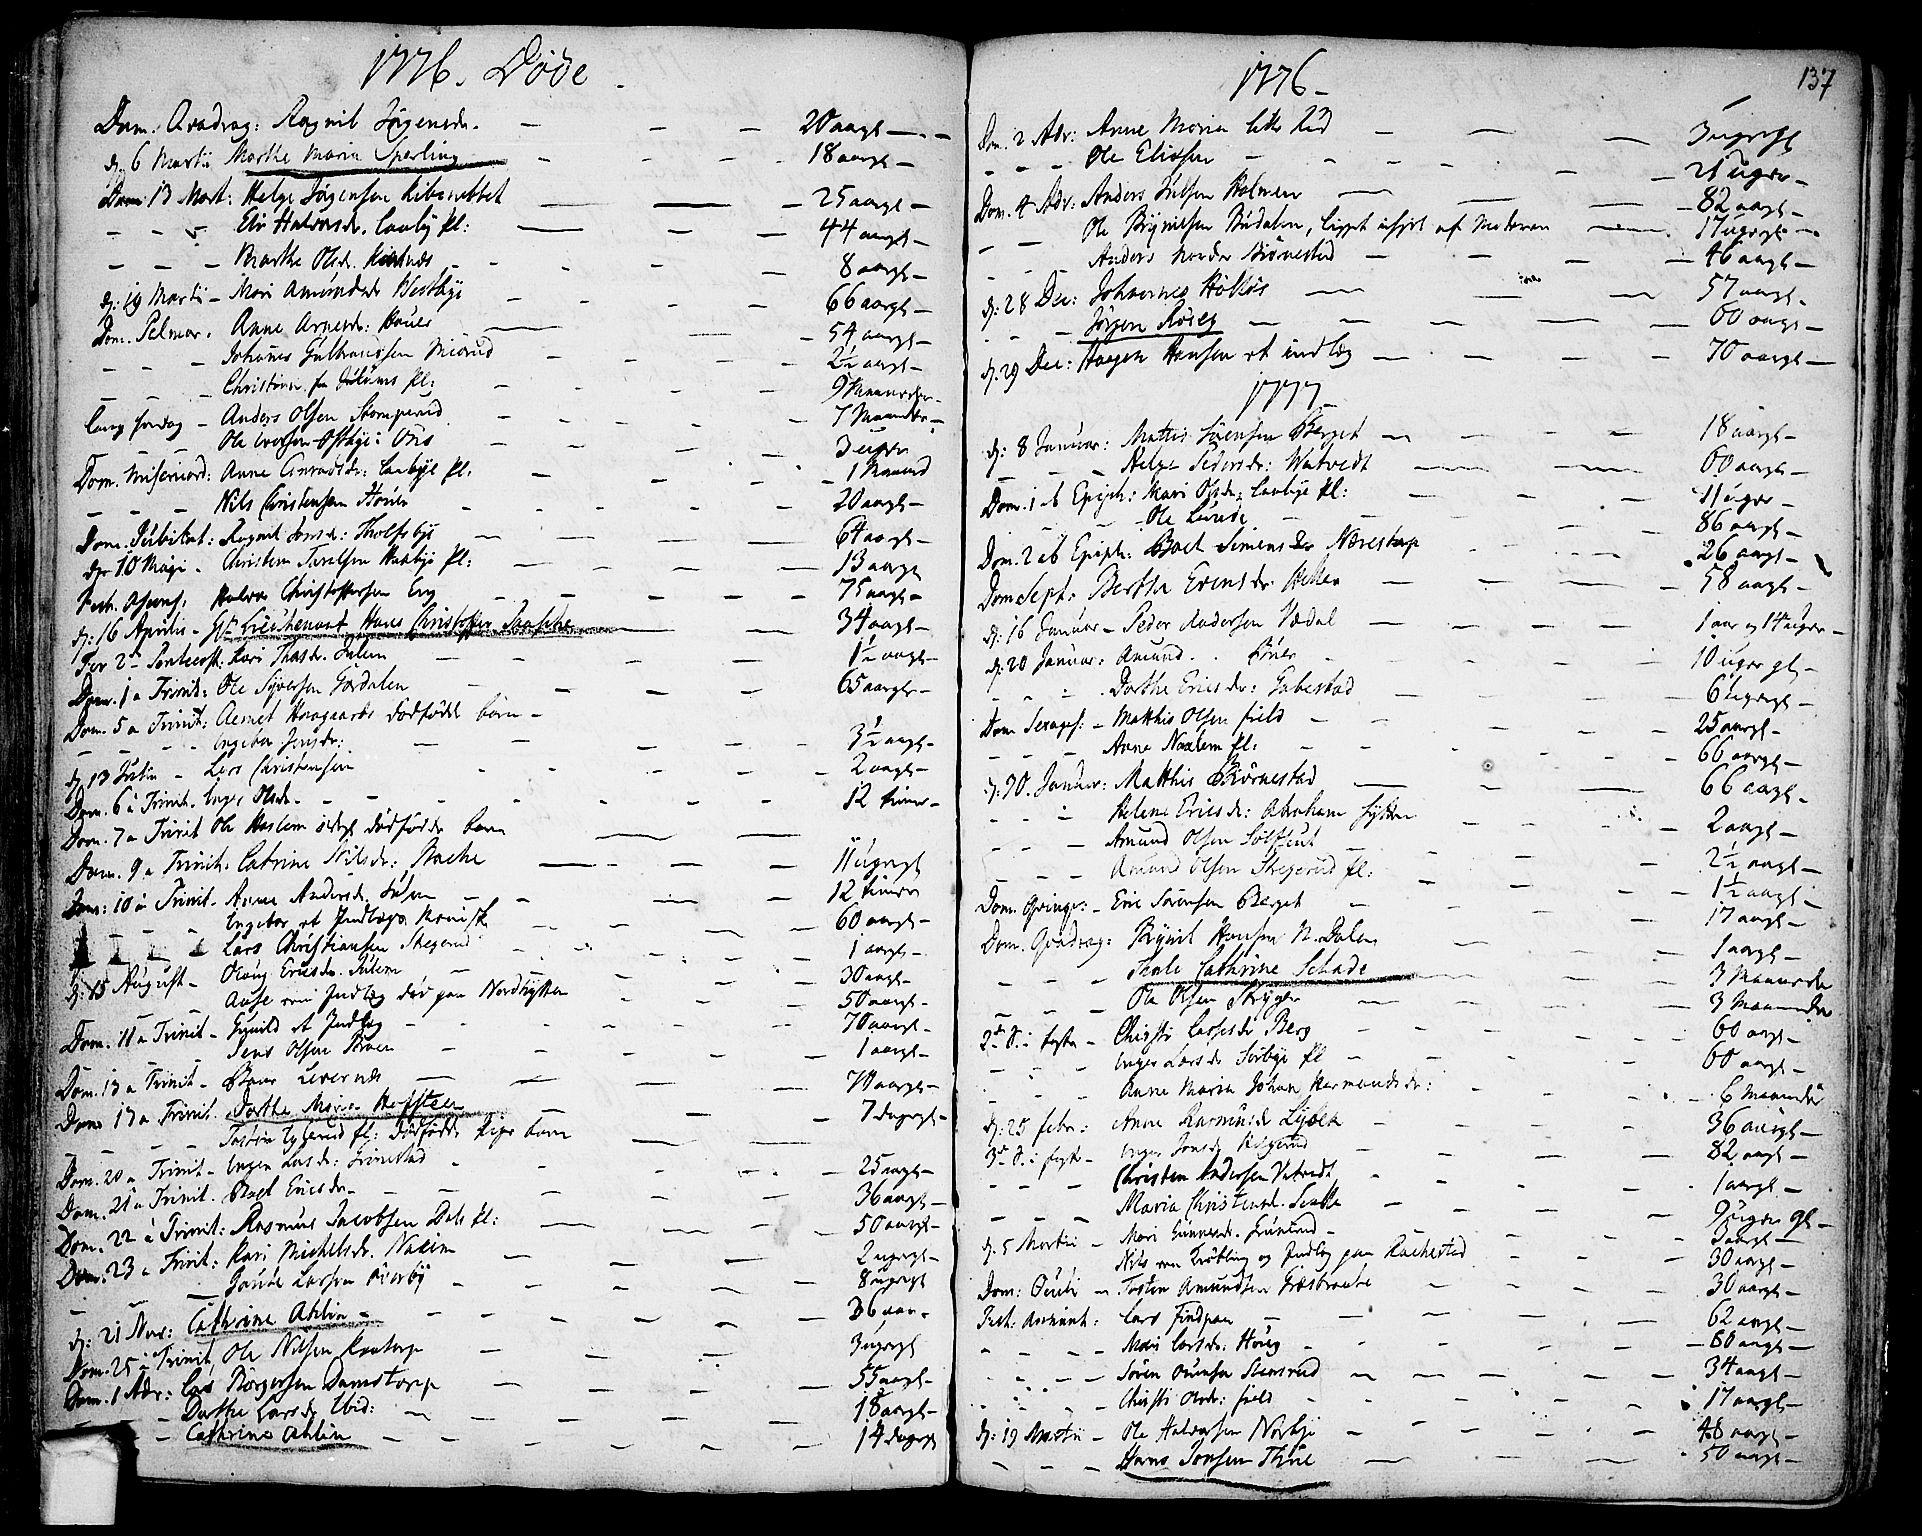 SAO, Rakkestad prestekontor Kirkebøker, F/Fa/L0003: Ministerialbok nr. I 3, 1752-1777, s. 137